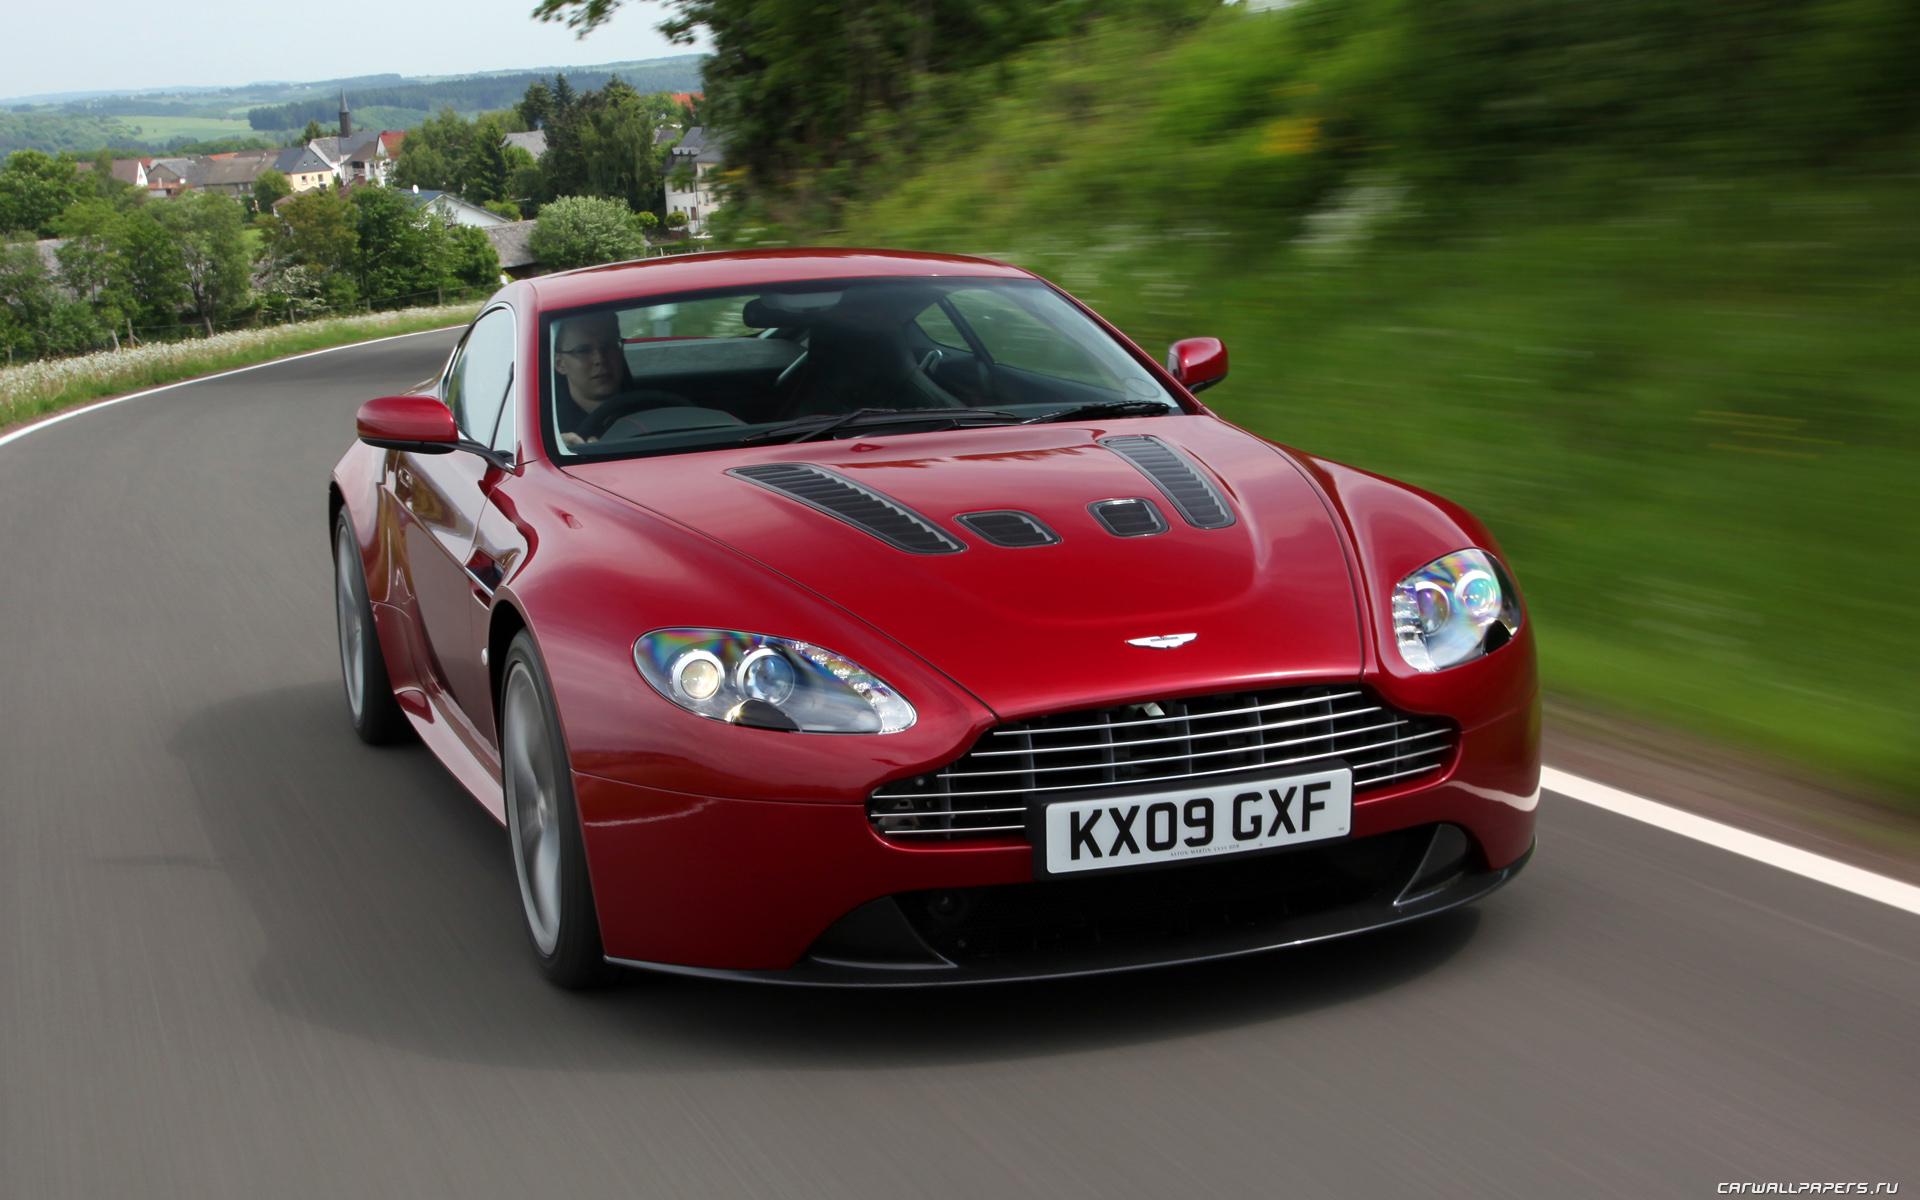 Cars Desktop Wallpapers Aston Martin V12 Vantage Magma Red 2009